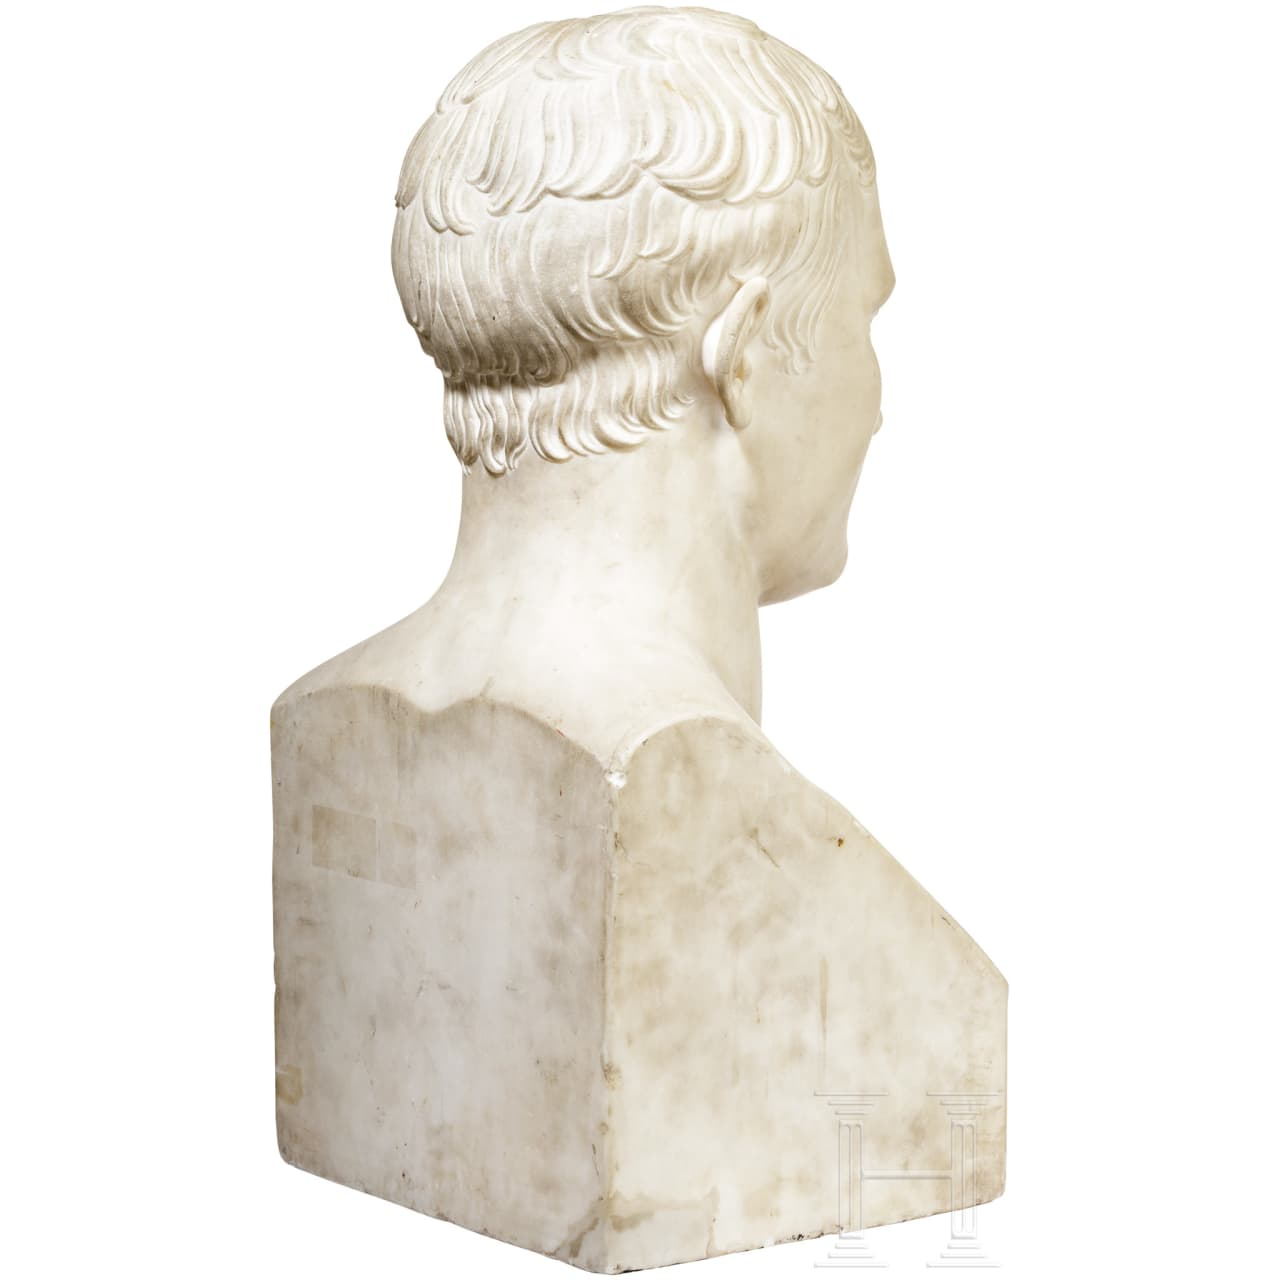 Imposante Büste von Napoléon Bonaparte, Frankreich, frühes 19. Jhdt.